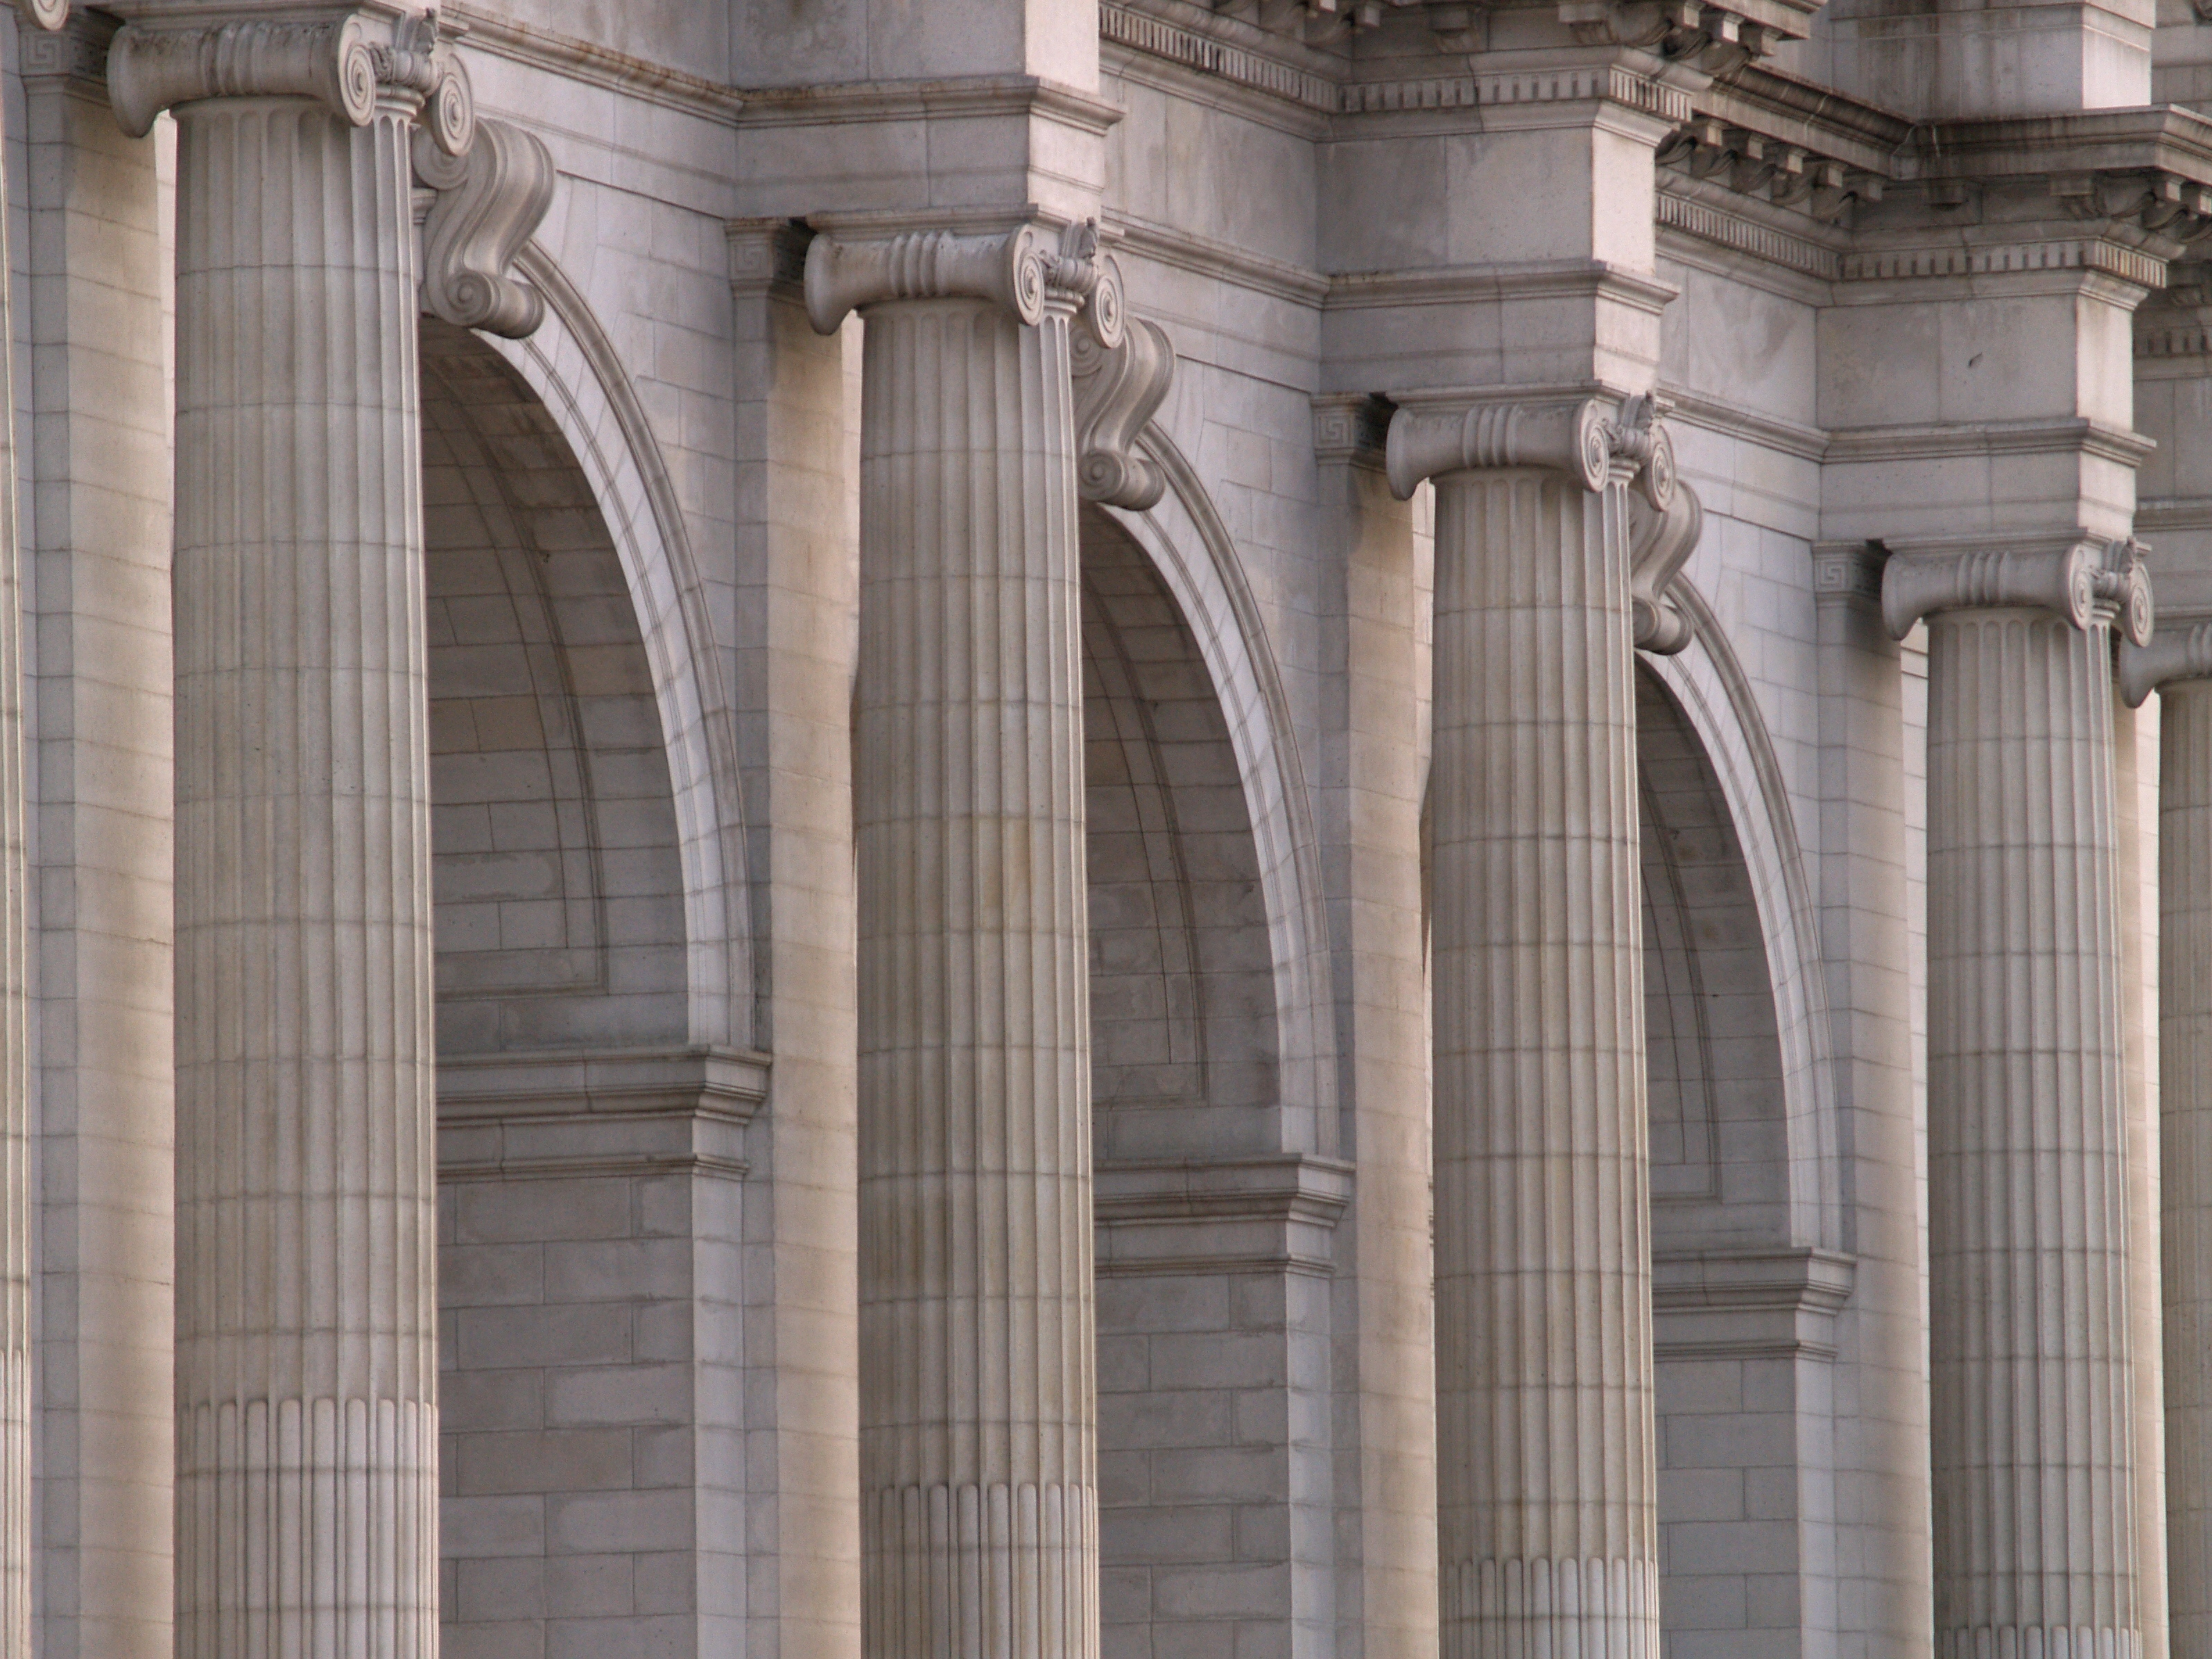 Pillars And Columns : File union station columns and arches washington dc g